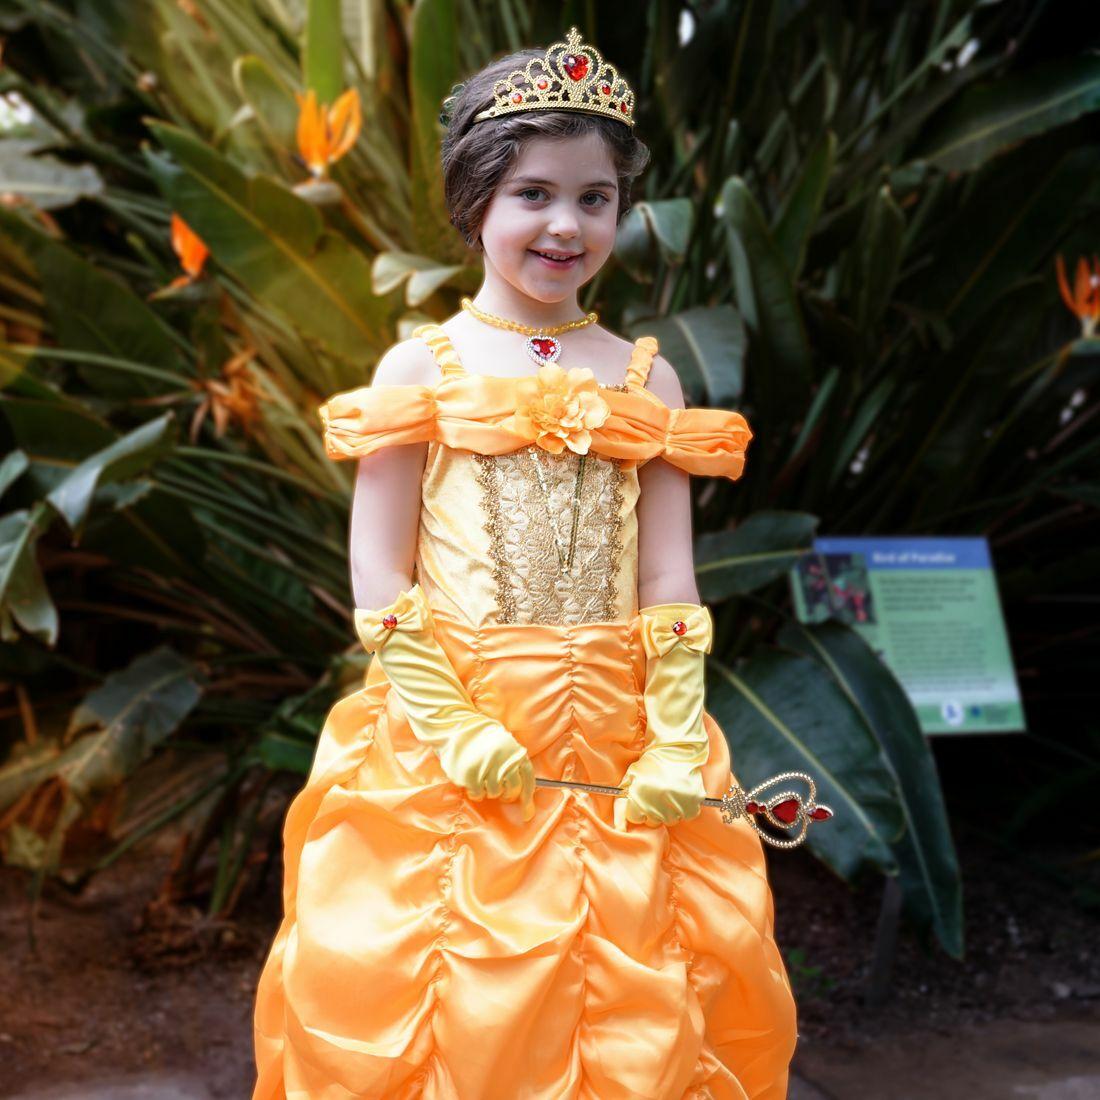 Girl in a tiara wearing a yellow princess dress